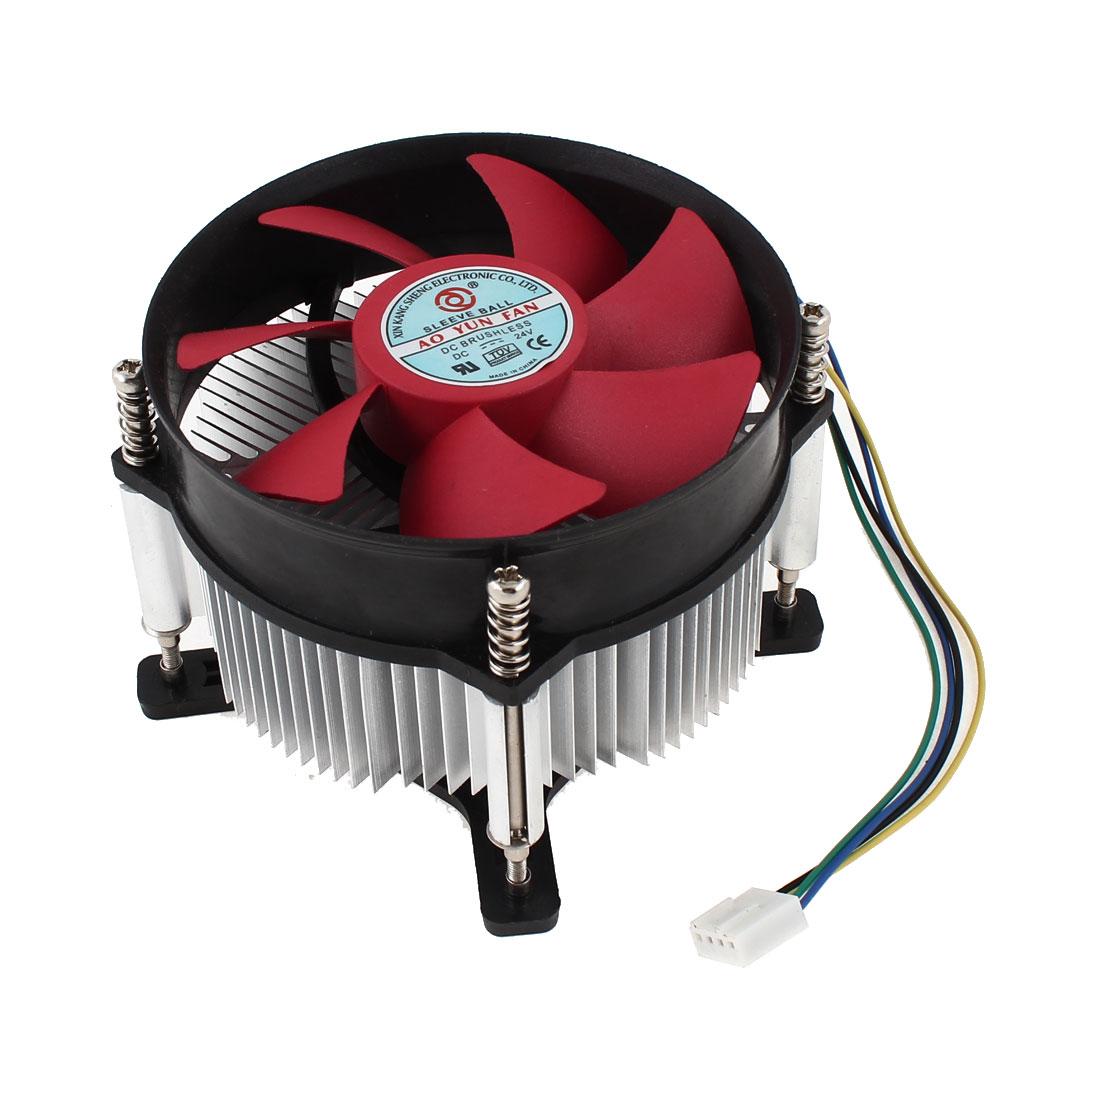 Desktop DC 12V PC 2000RPM Speed CPU Cooling Fan Cooler Heatsink Red